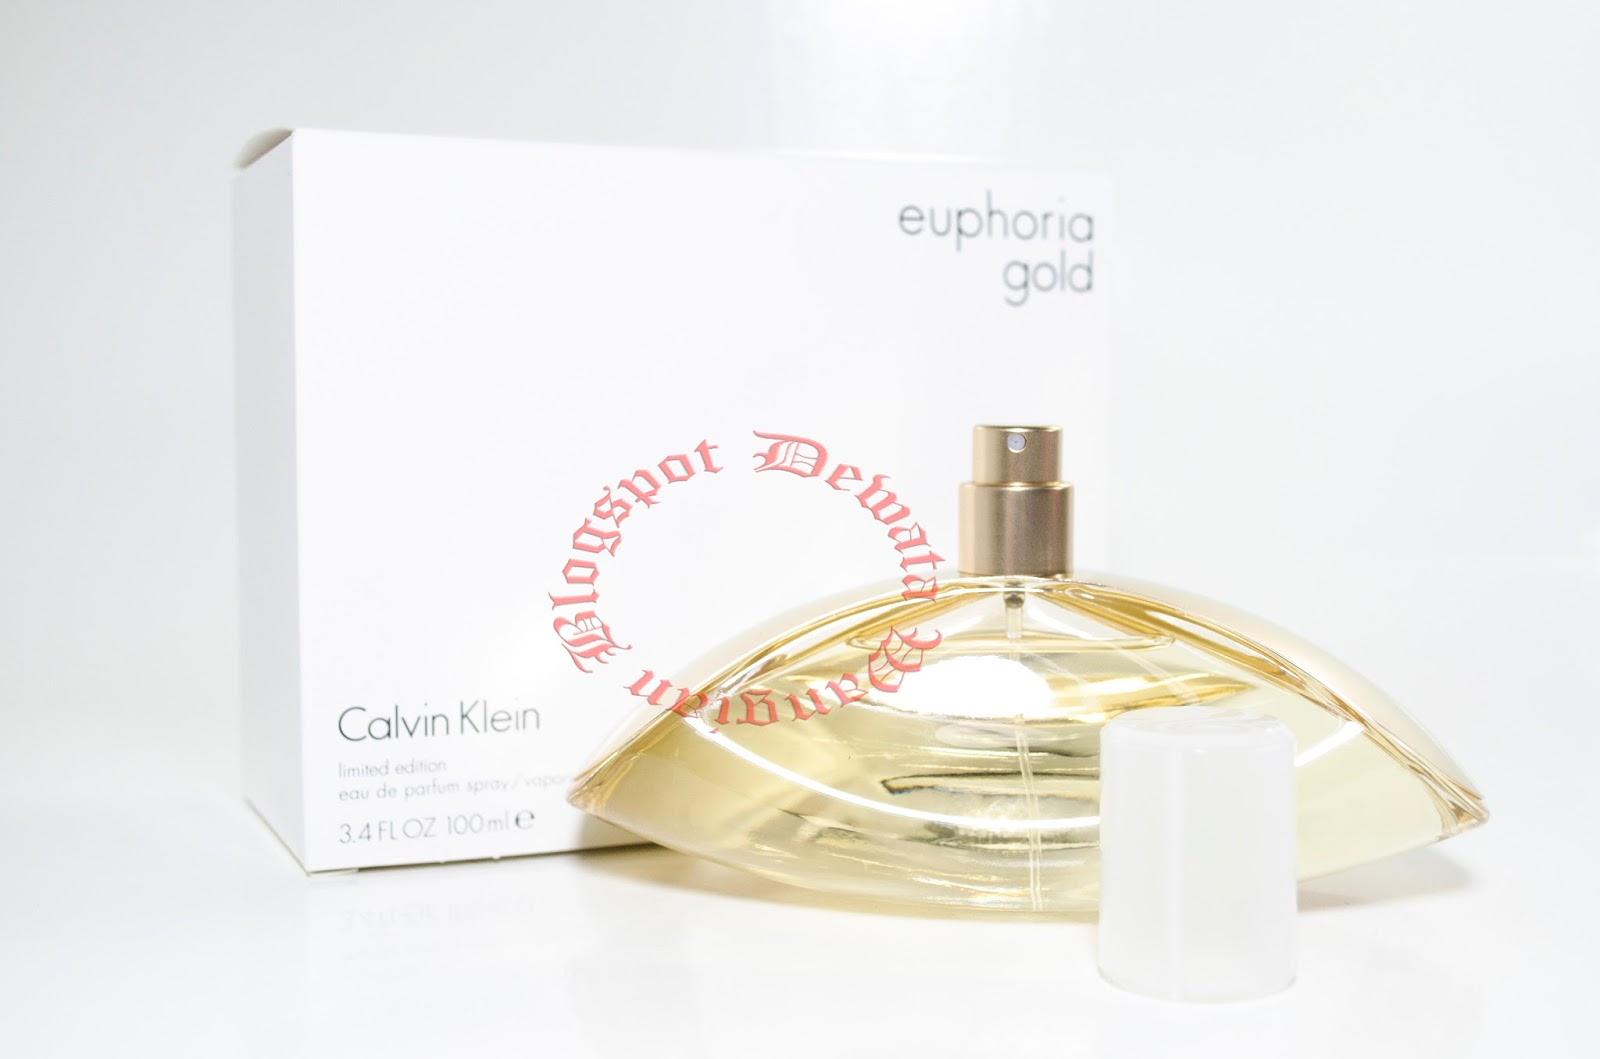 calvin klein euphoria gold for women tester perfume. Black Bedroom Furniture Sets. Home Design Ideas